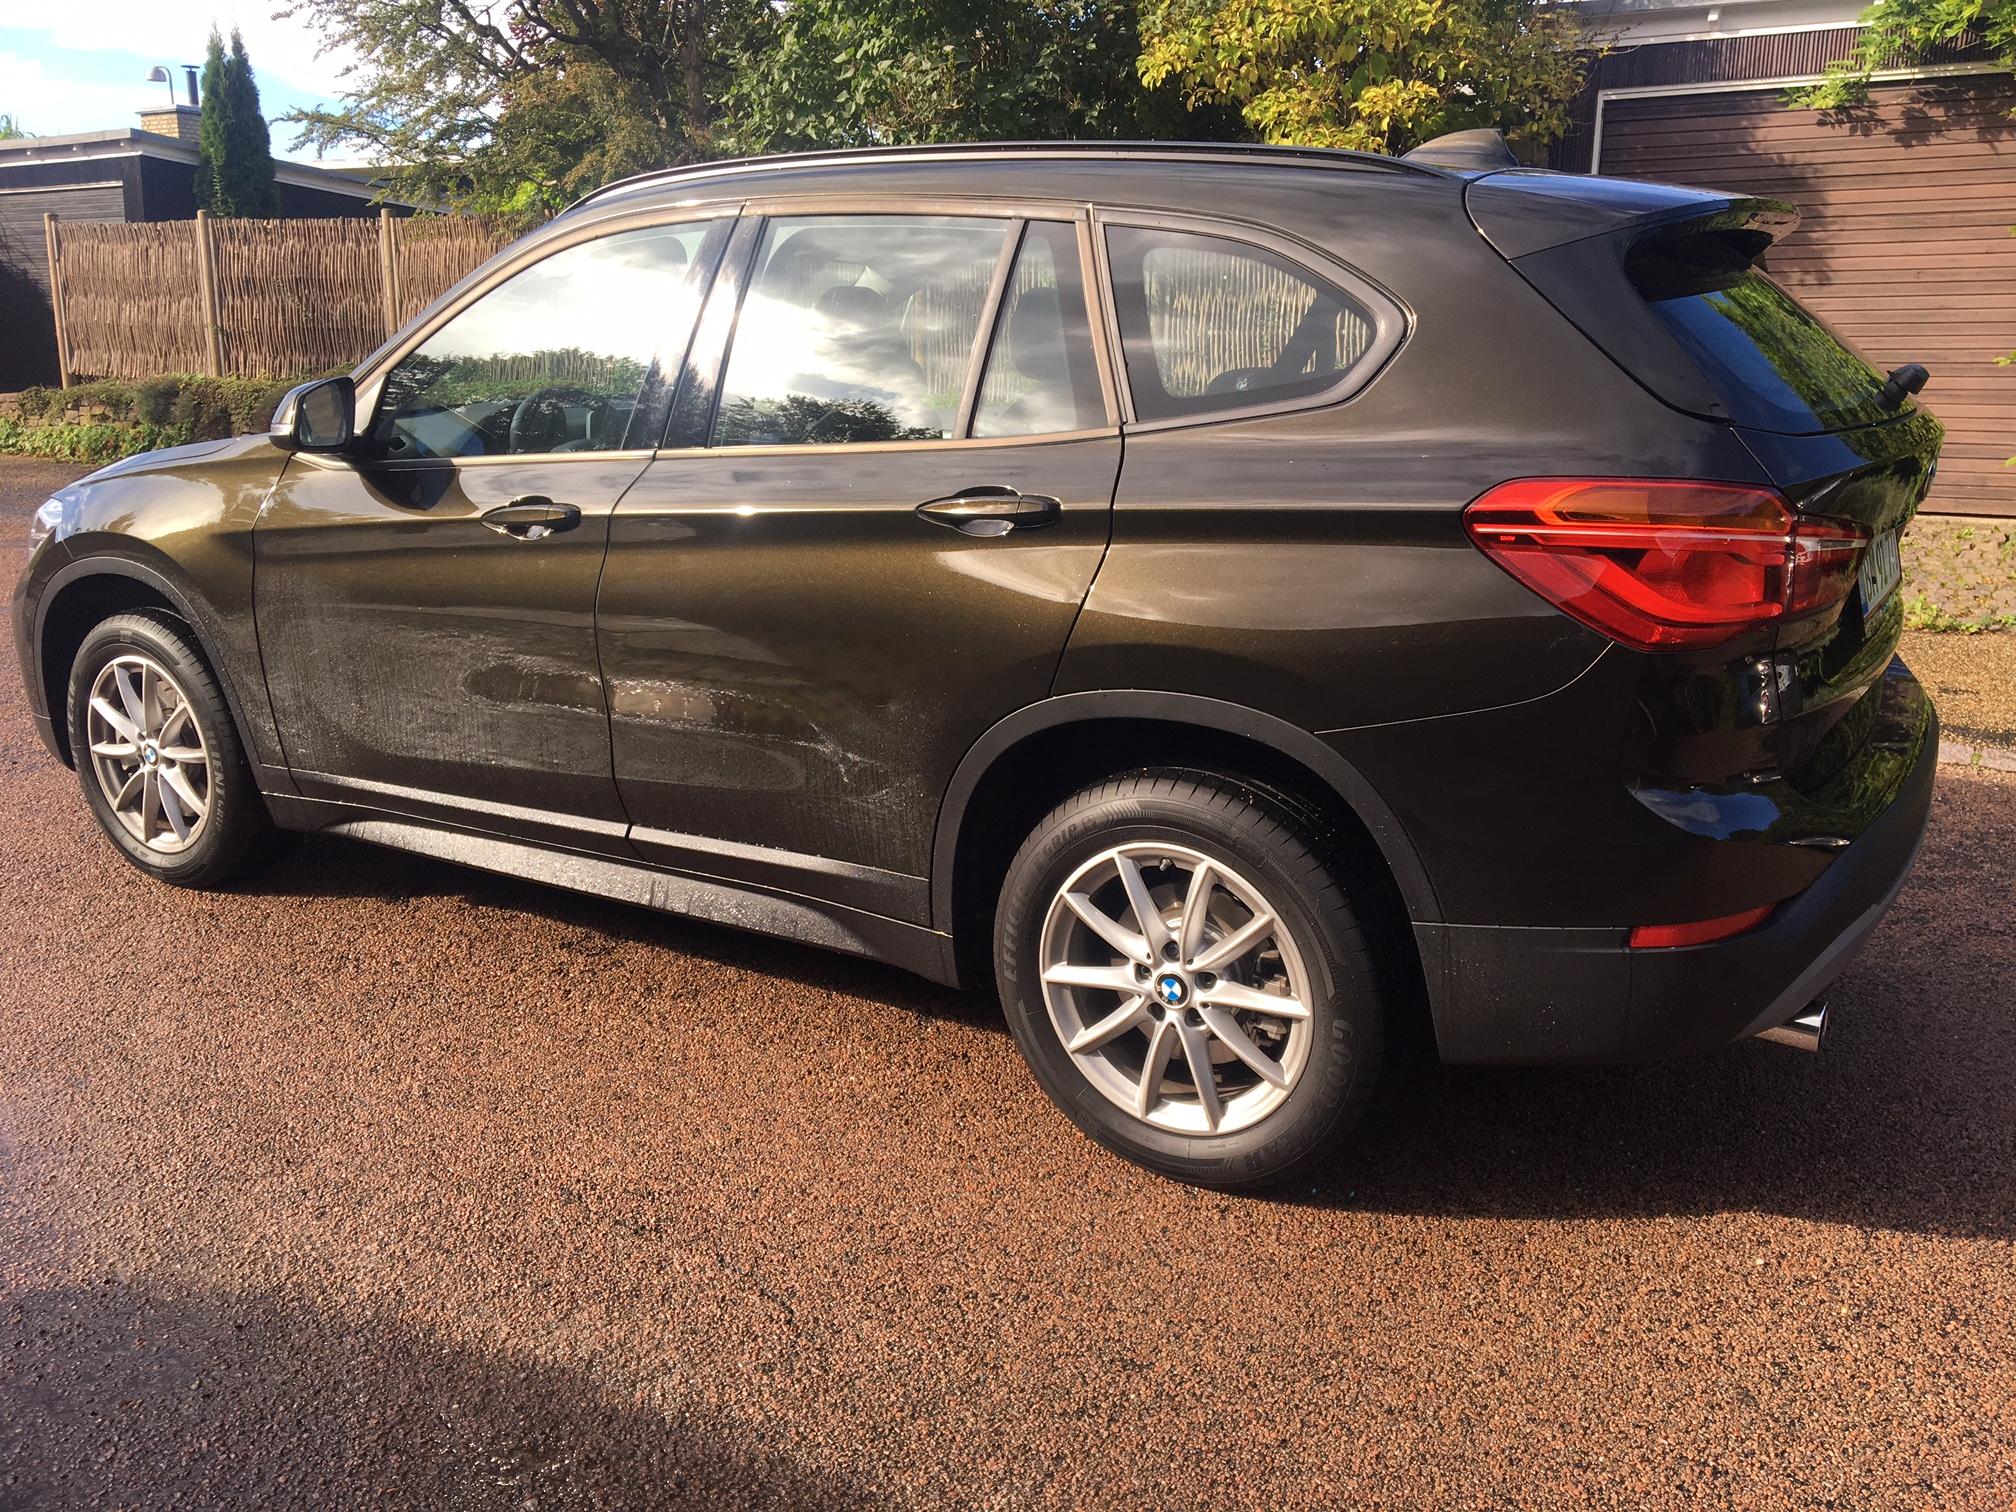 First Drive: BMW X1 sDrive18d